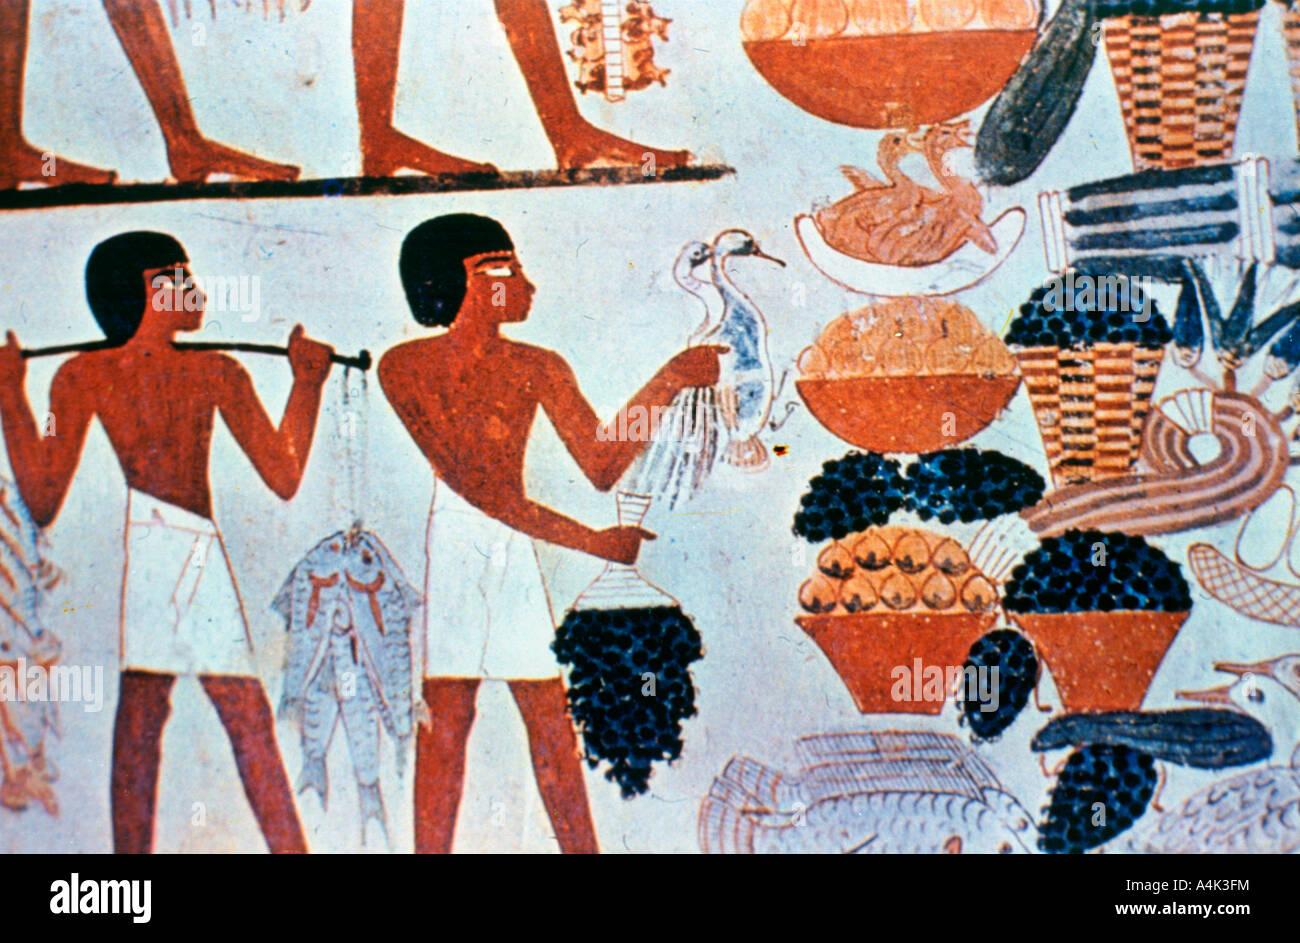 Ancient Egyptian Painting Food Stockfotos Und Bilder Kaufen Alamy